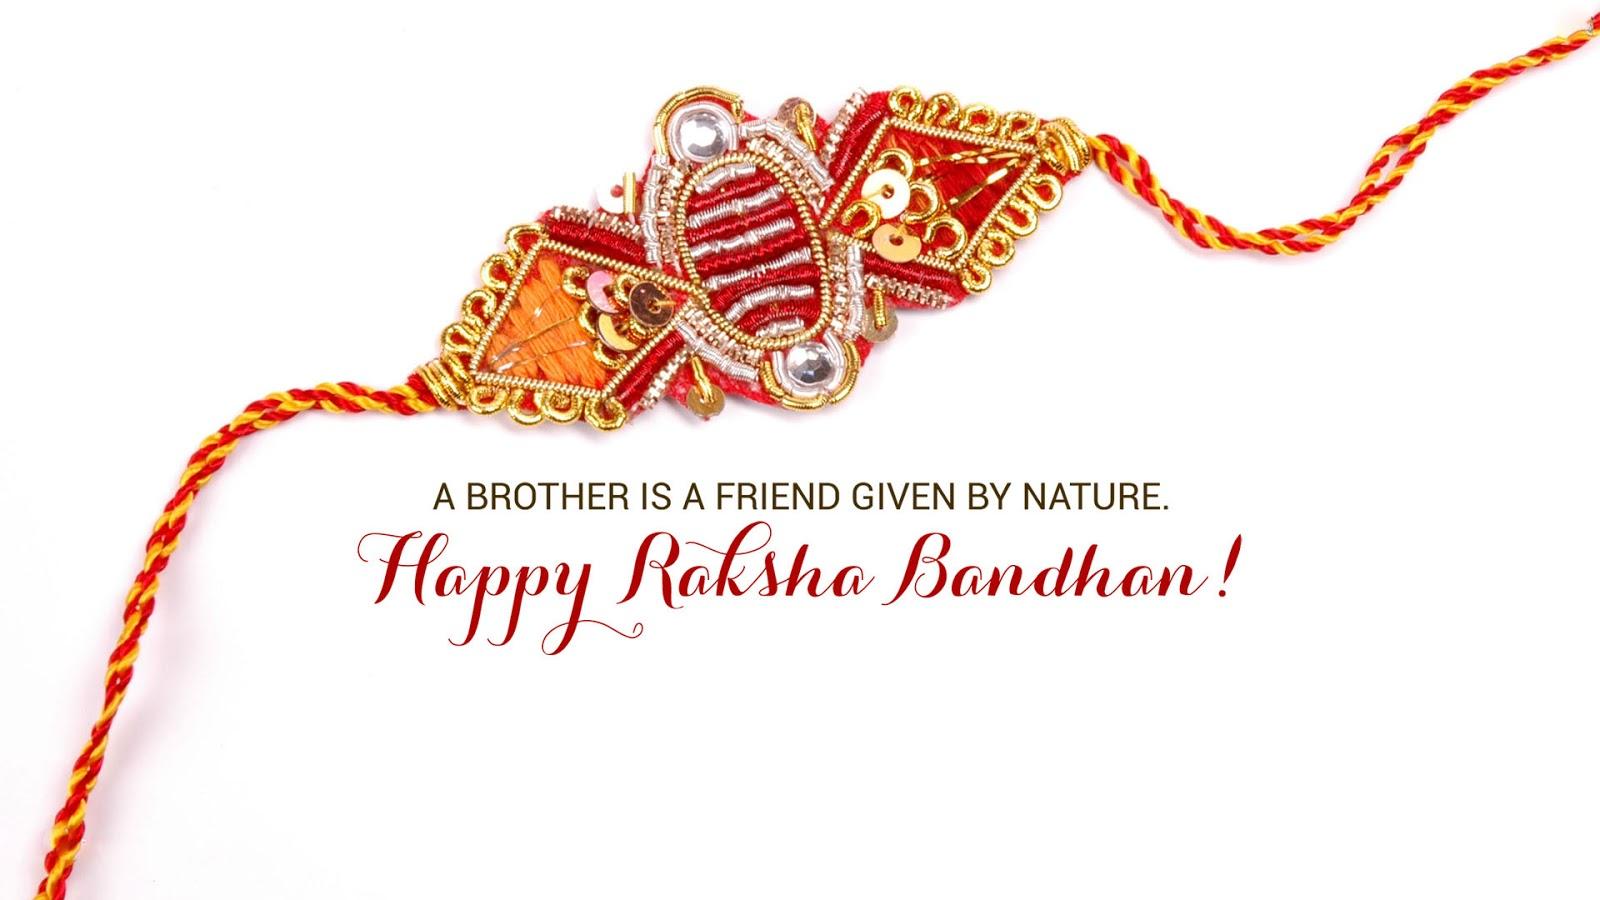 Wallpaper download jokes - Rakhi Images For Brothers